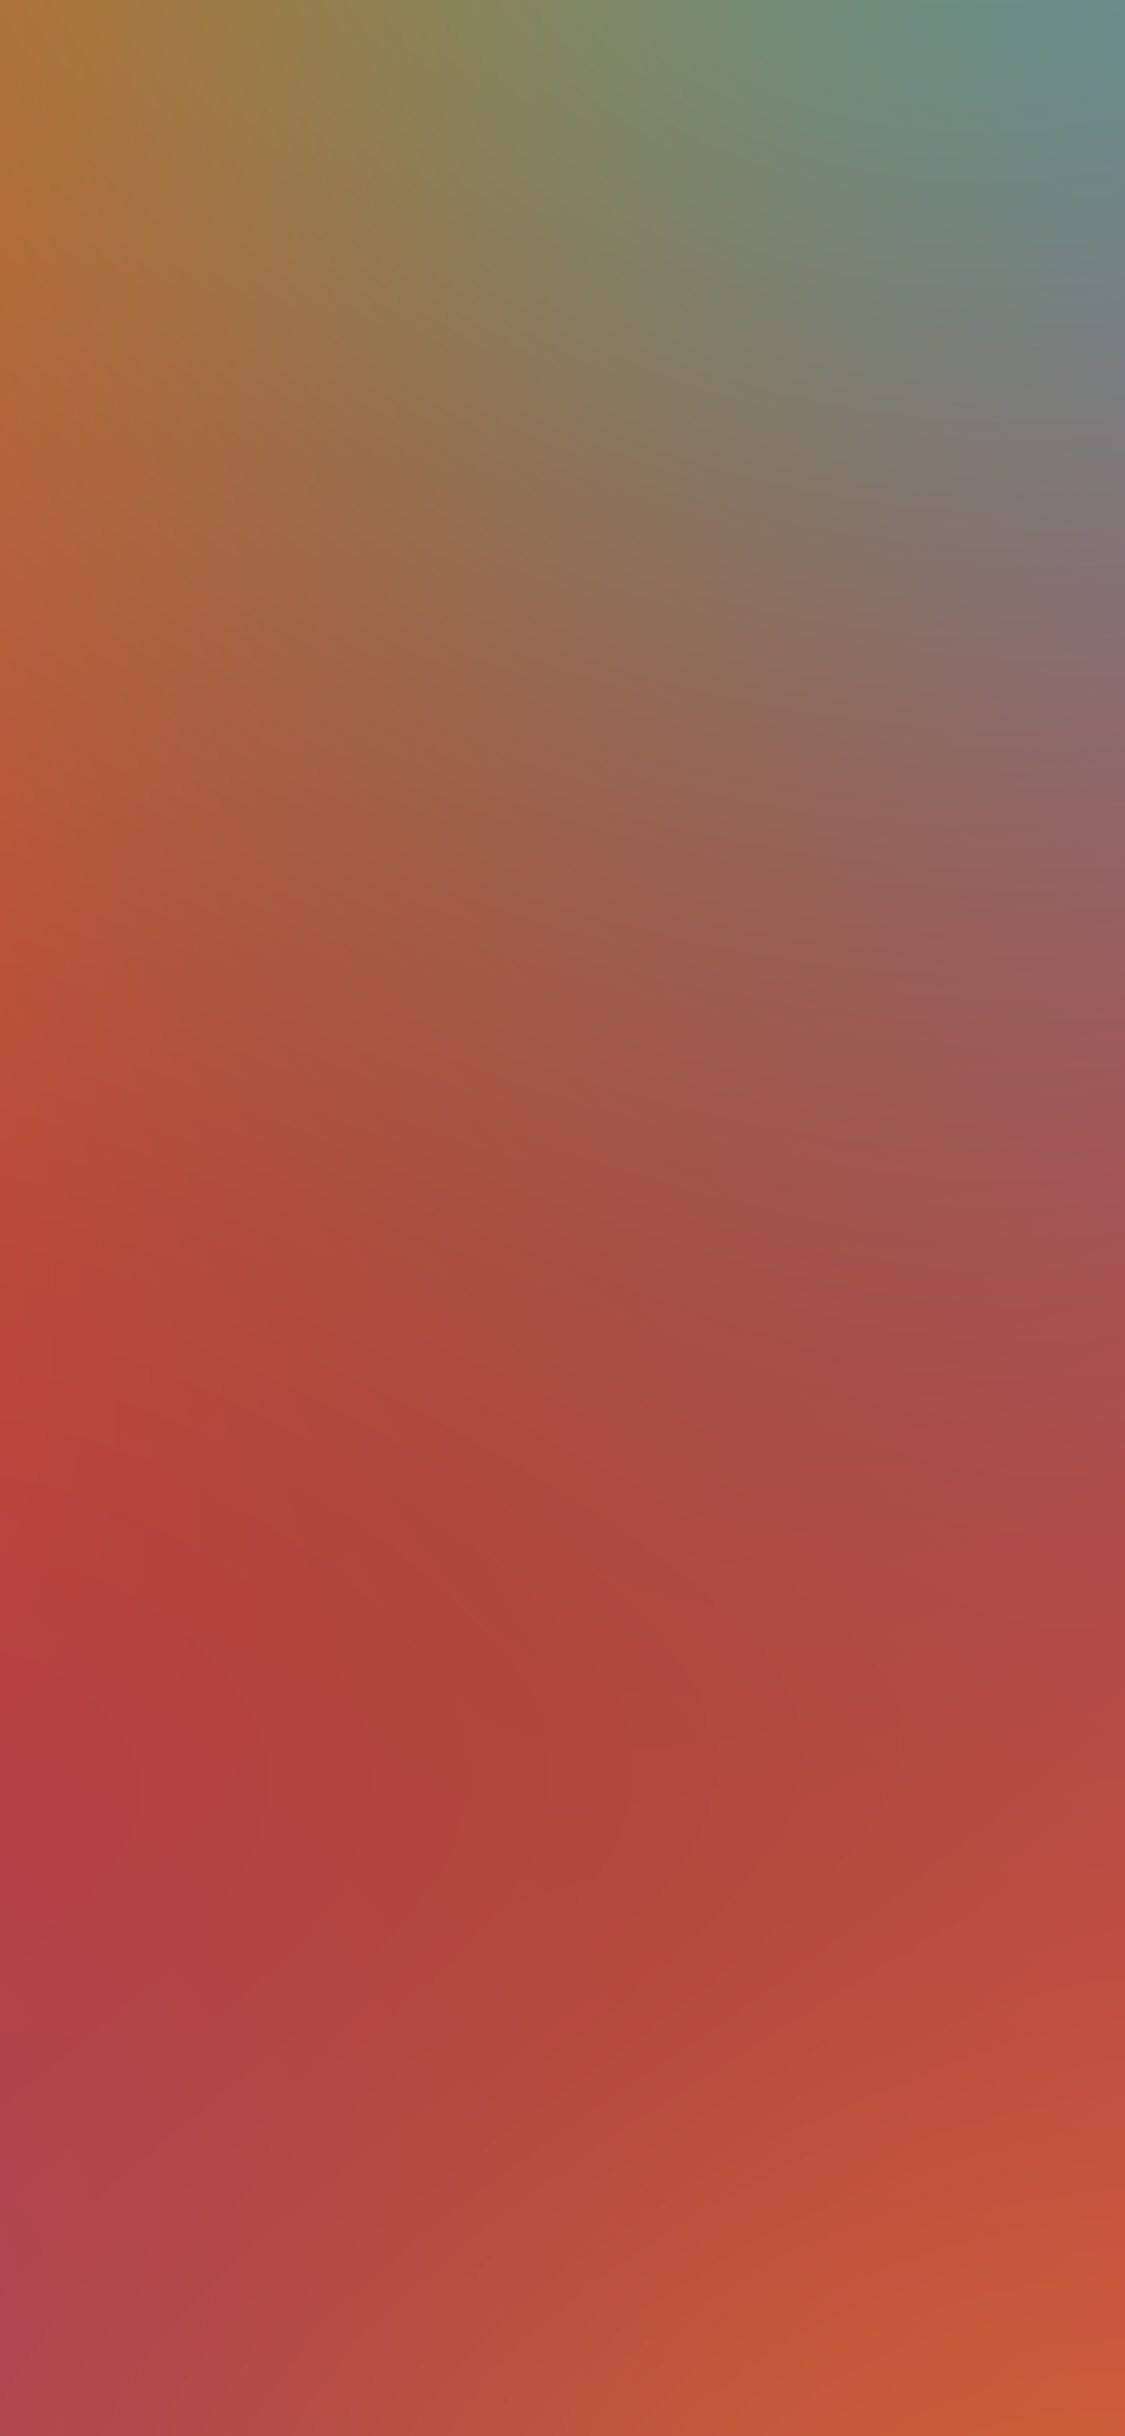 iPhonexpapers.com-Apple-iPhone-wallpaper-sn69-hot-red-summer-blur-gradation